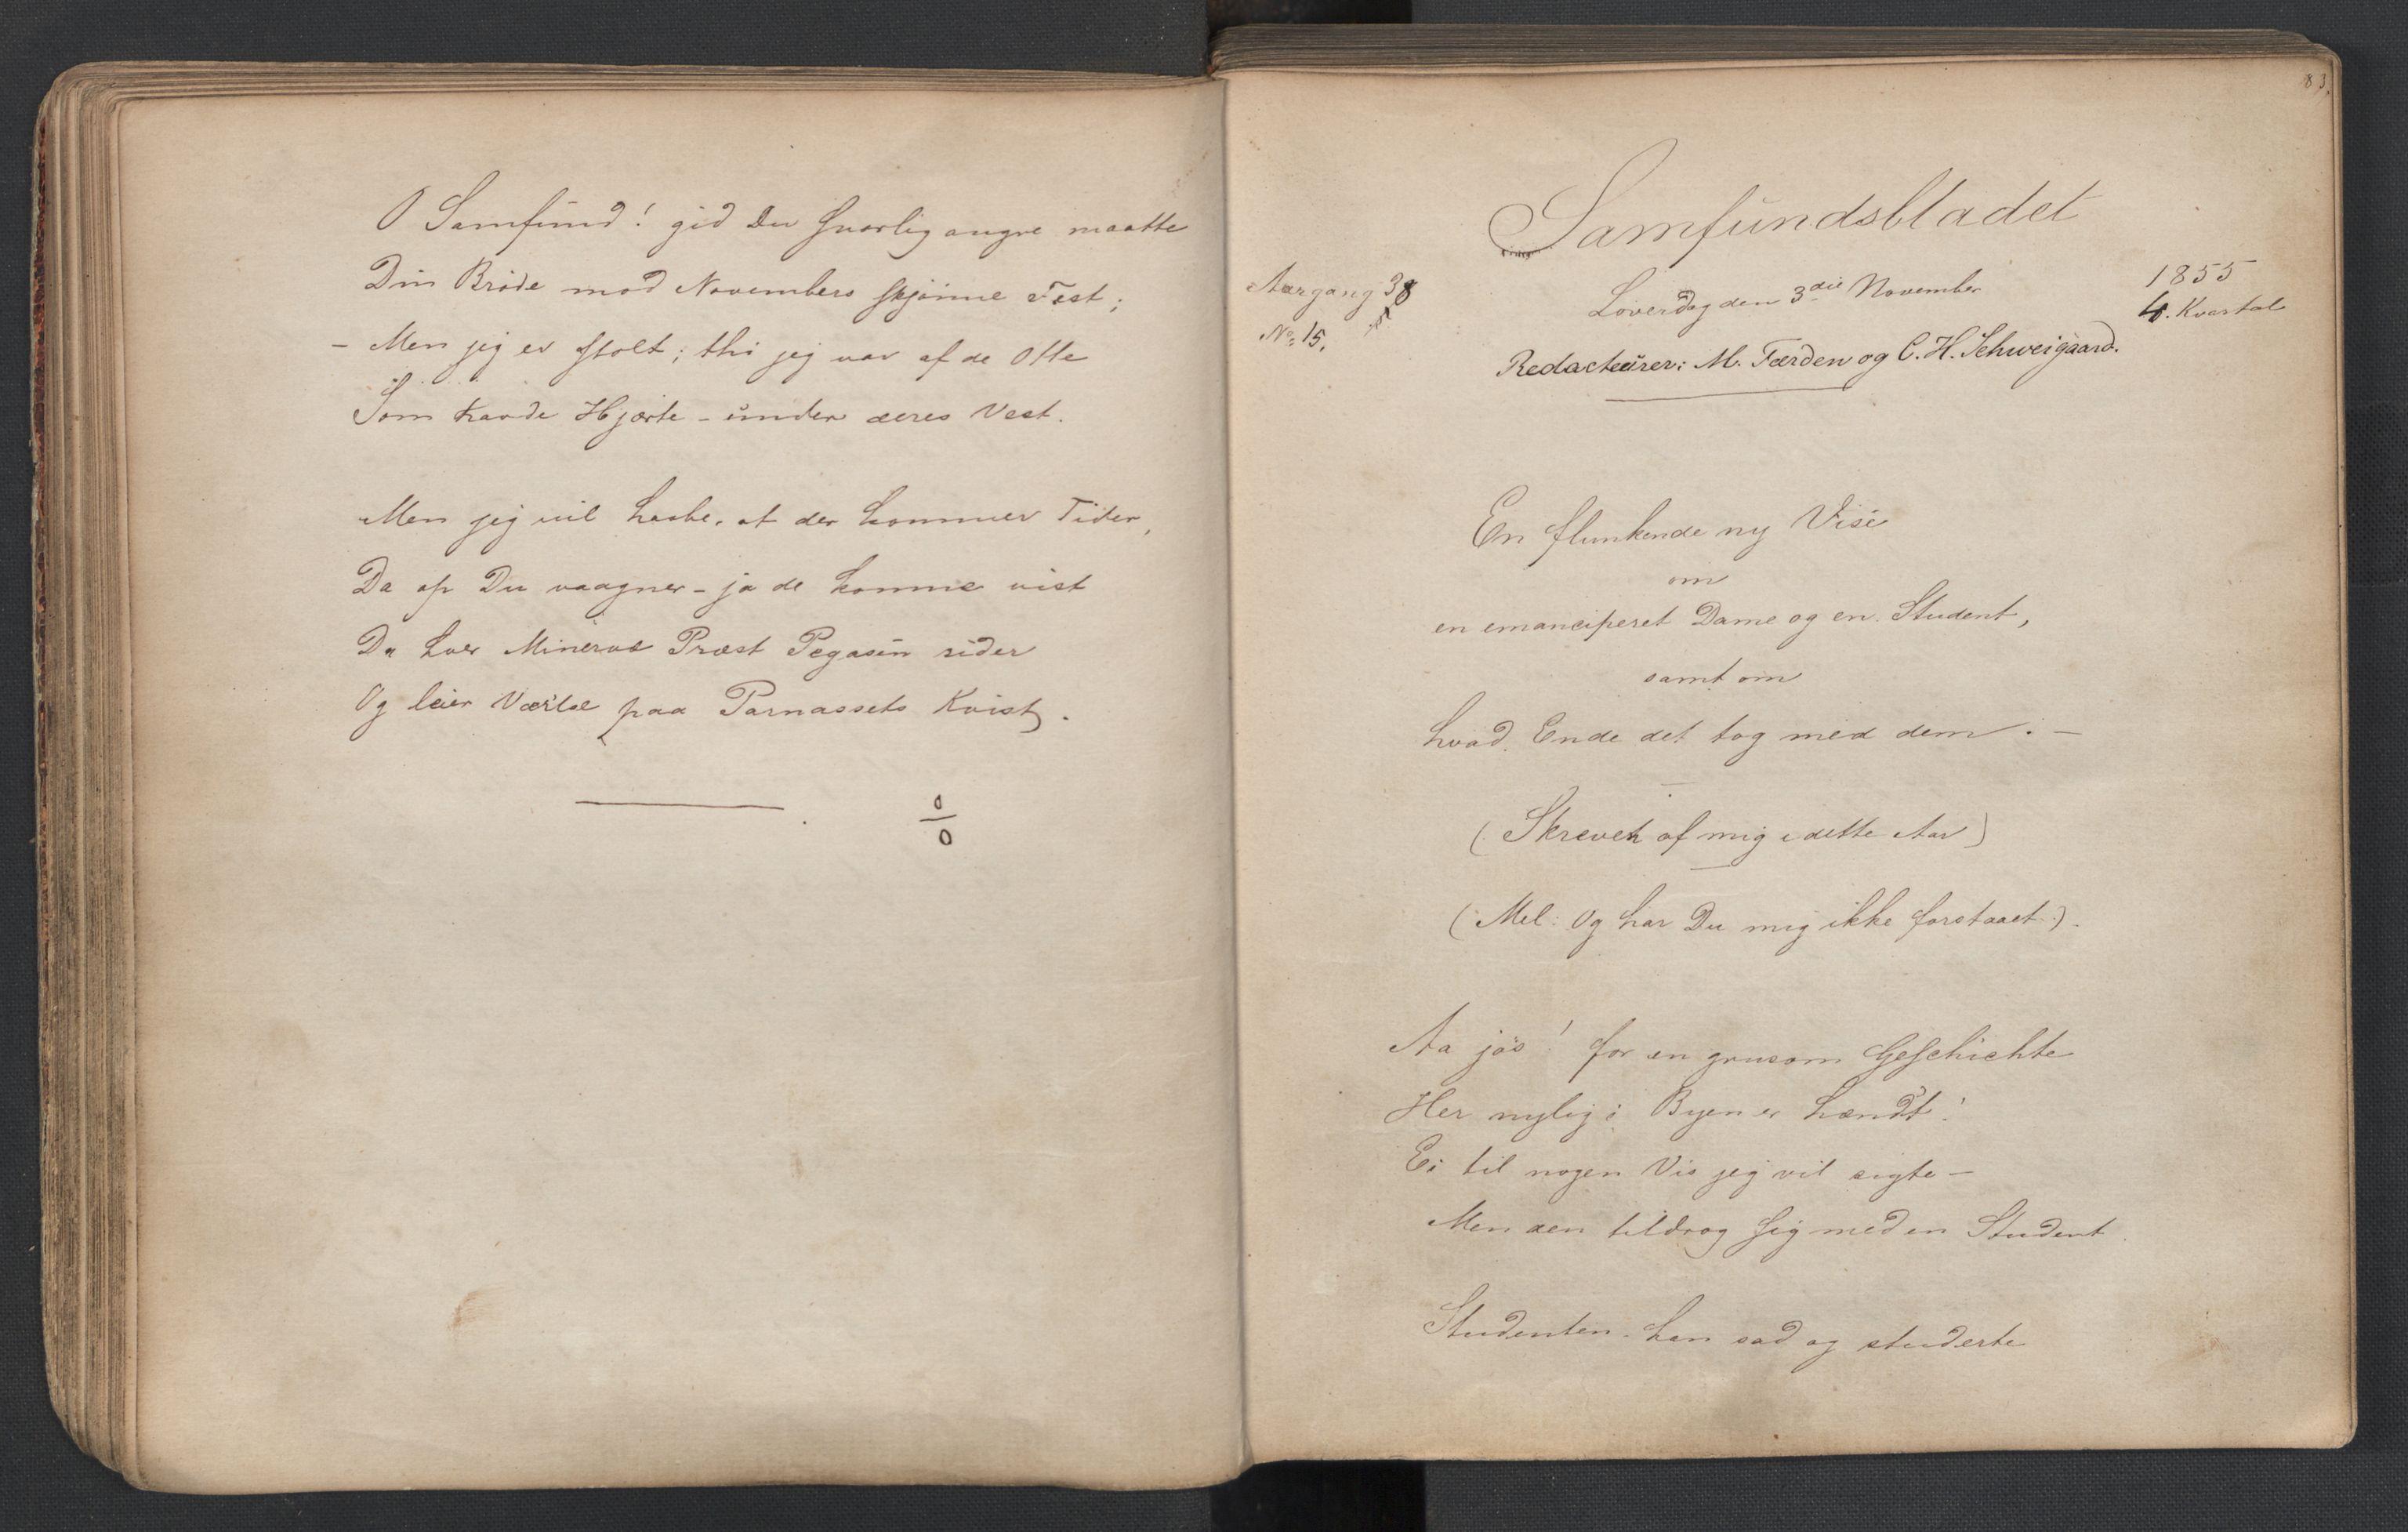 RA, Det Norske Studentersamfund, X/Xa/L0005, 1855-1856, s. 43